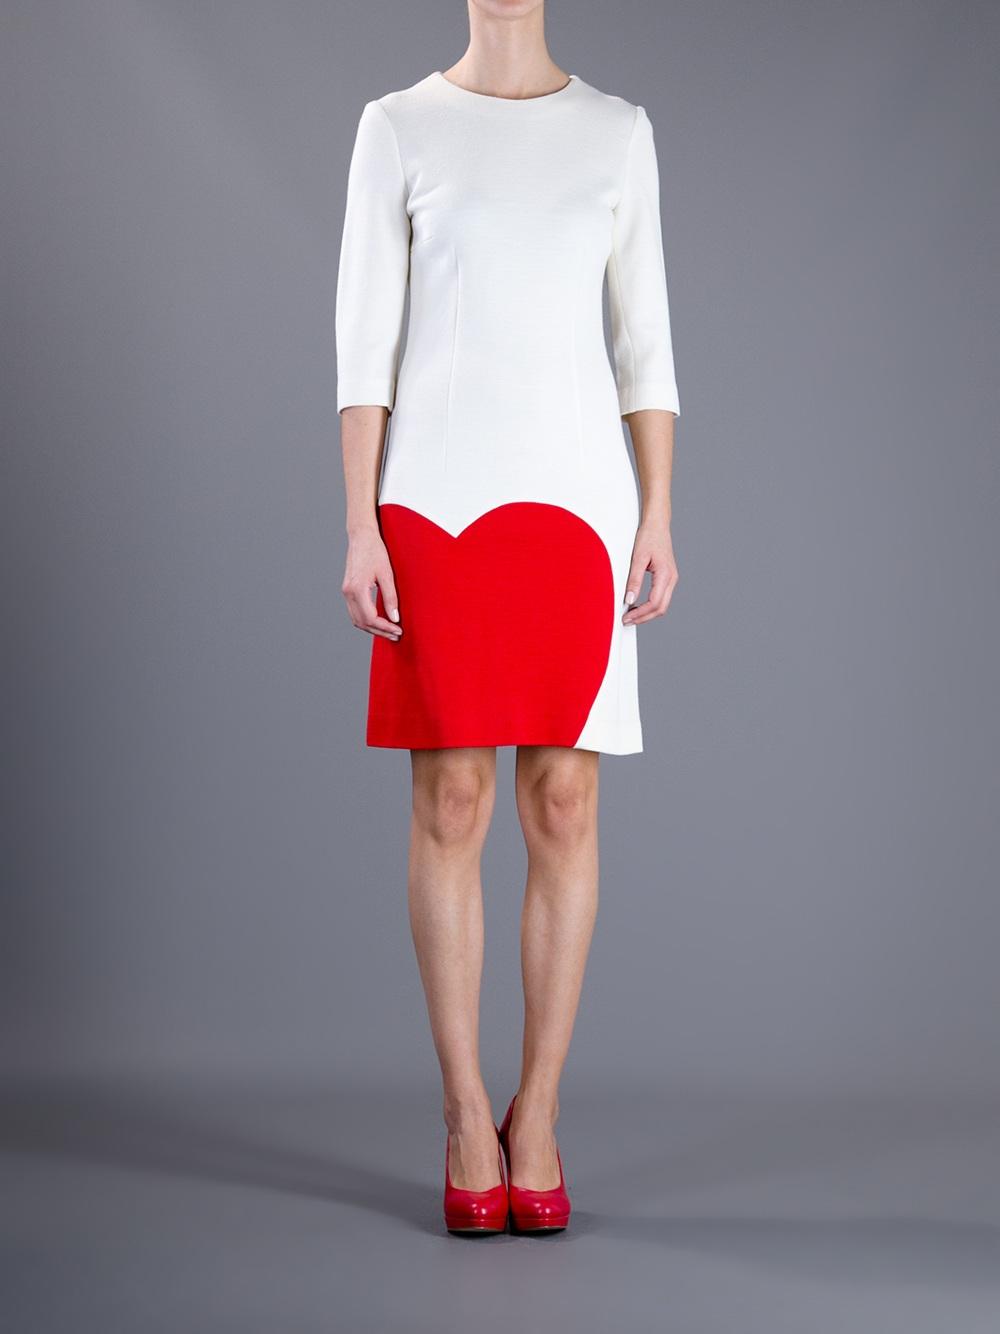 Lyst Moschino Heart Dress In White